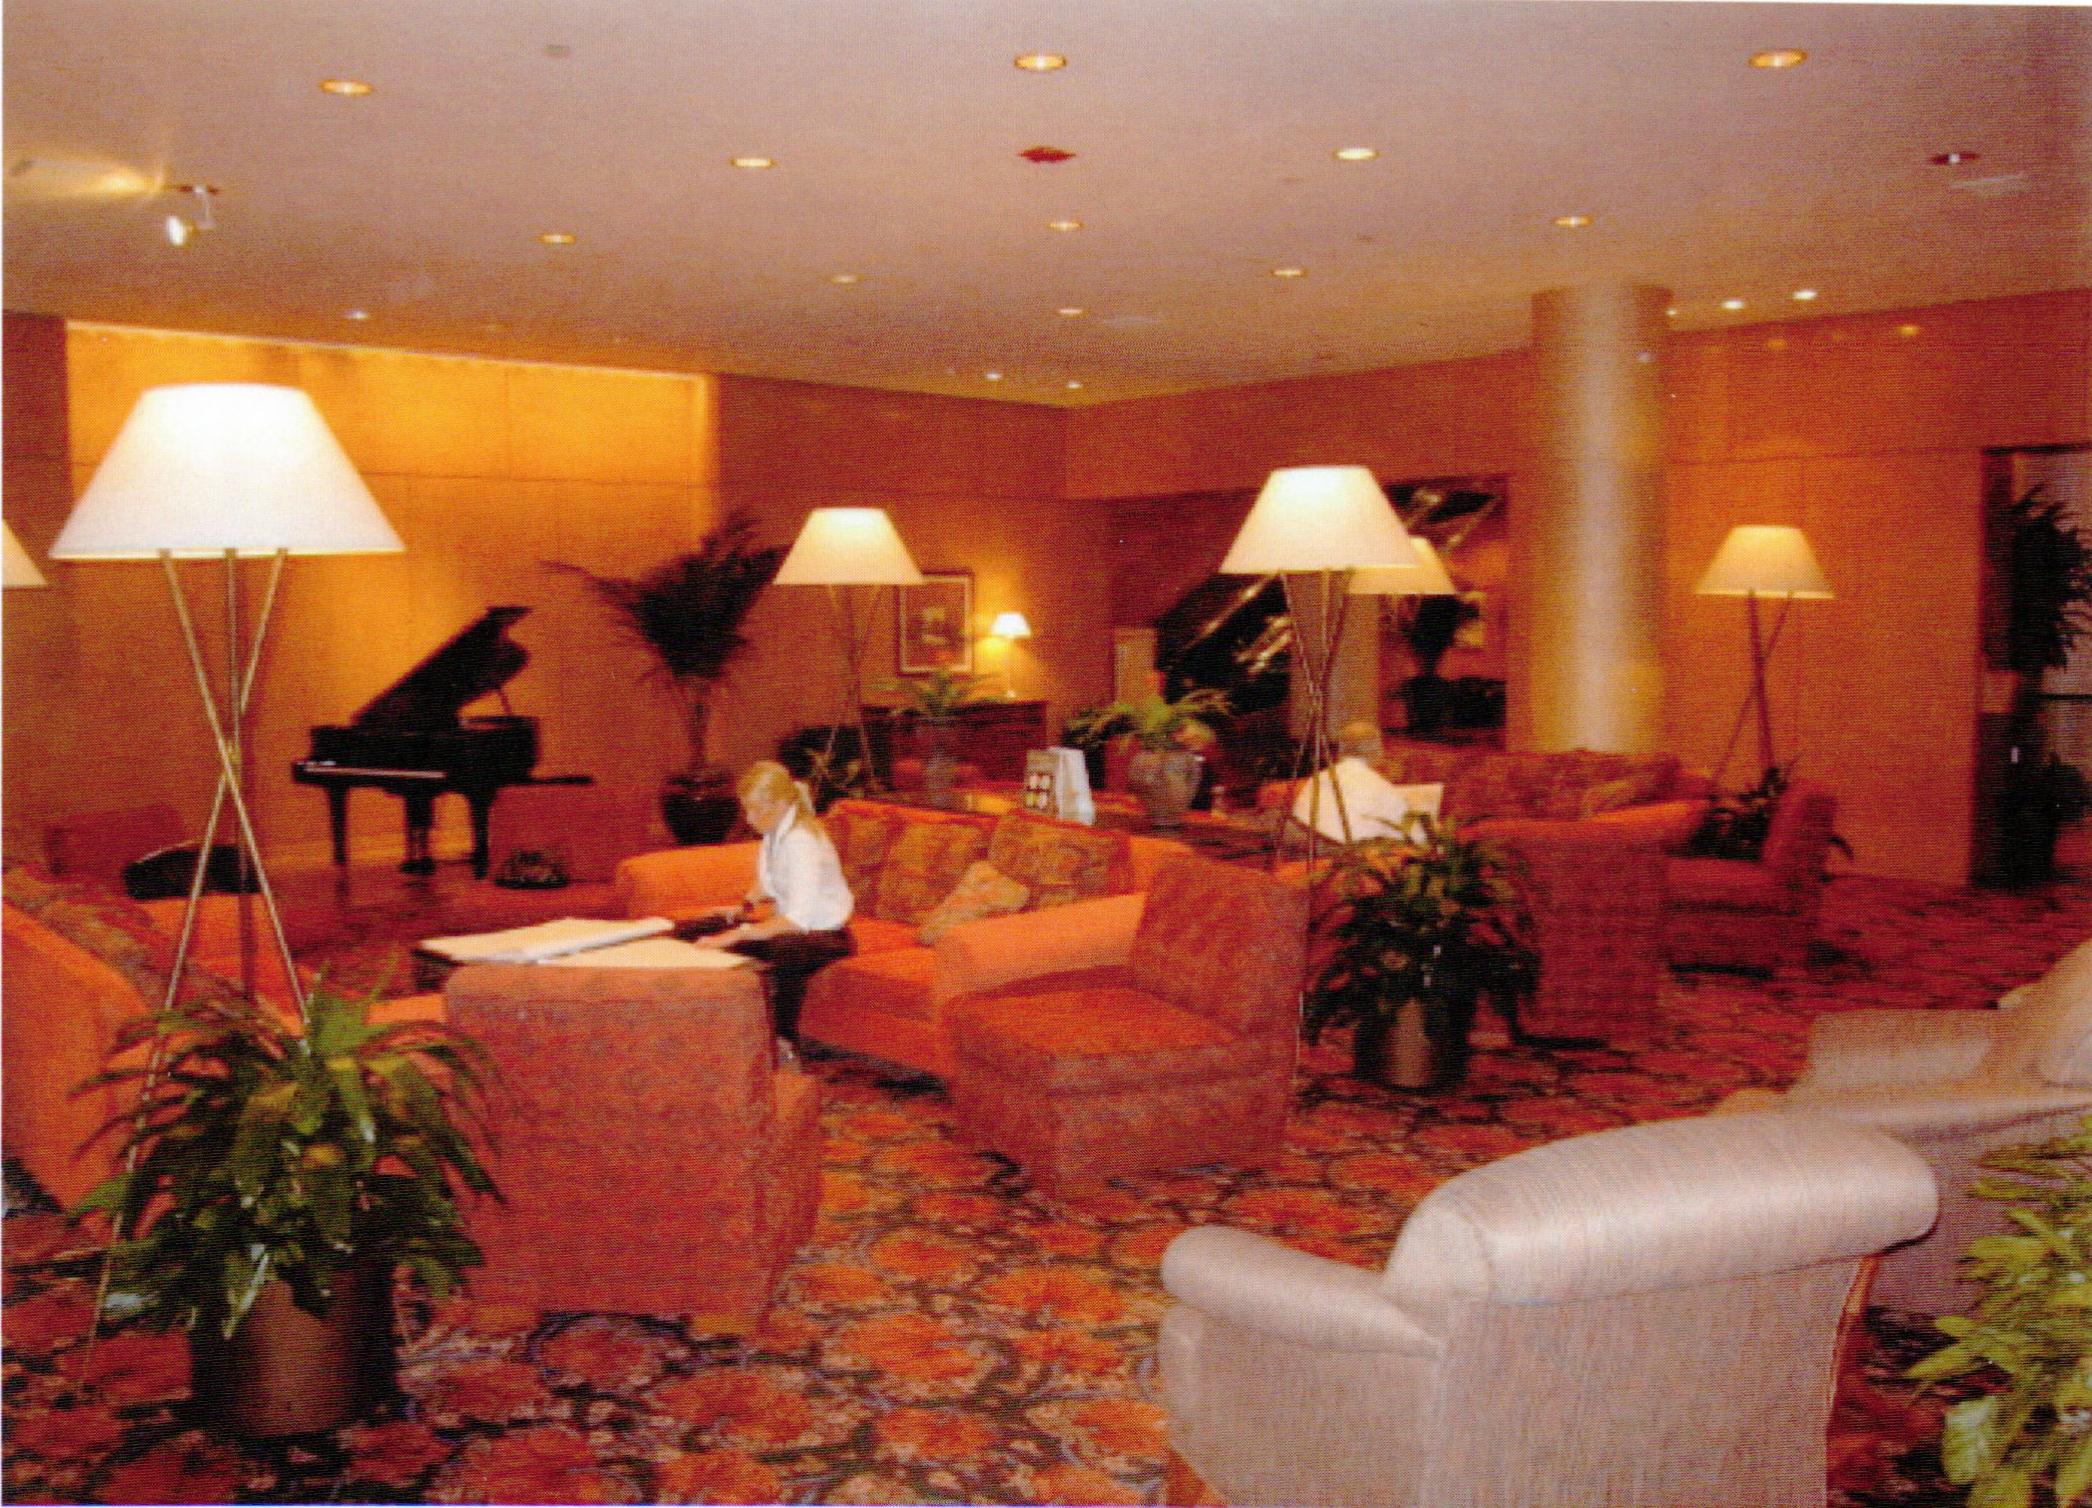 WESTIN Lobby  Before.jpg